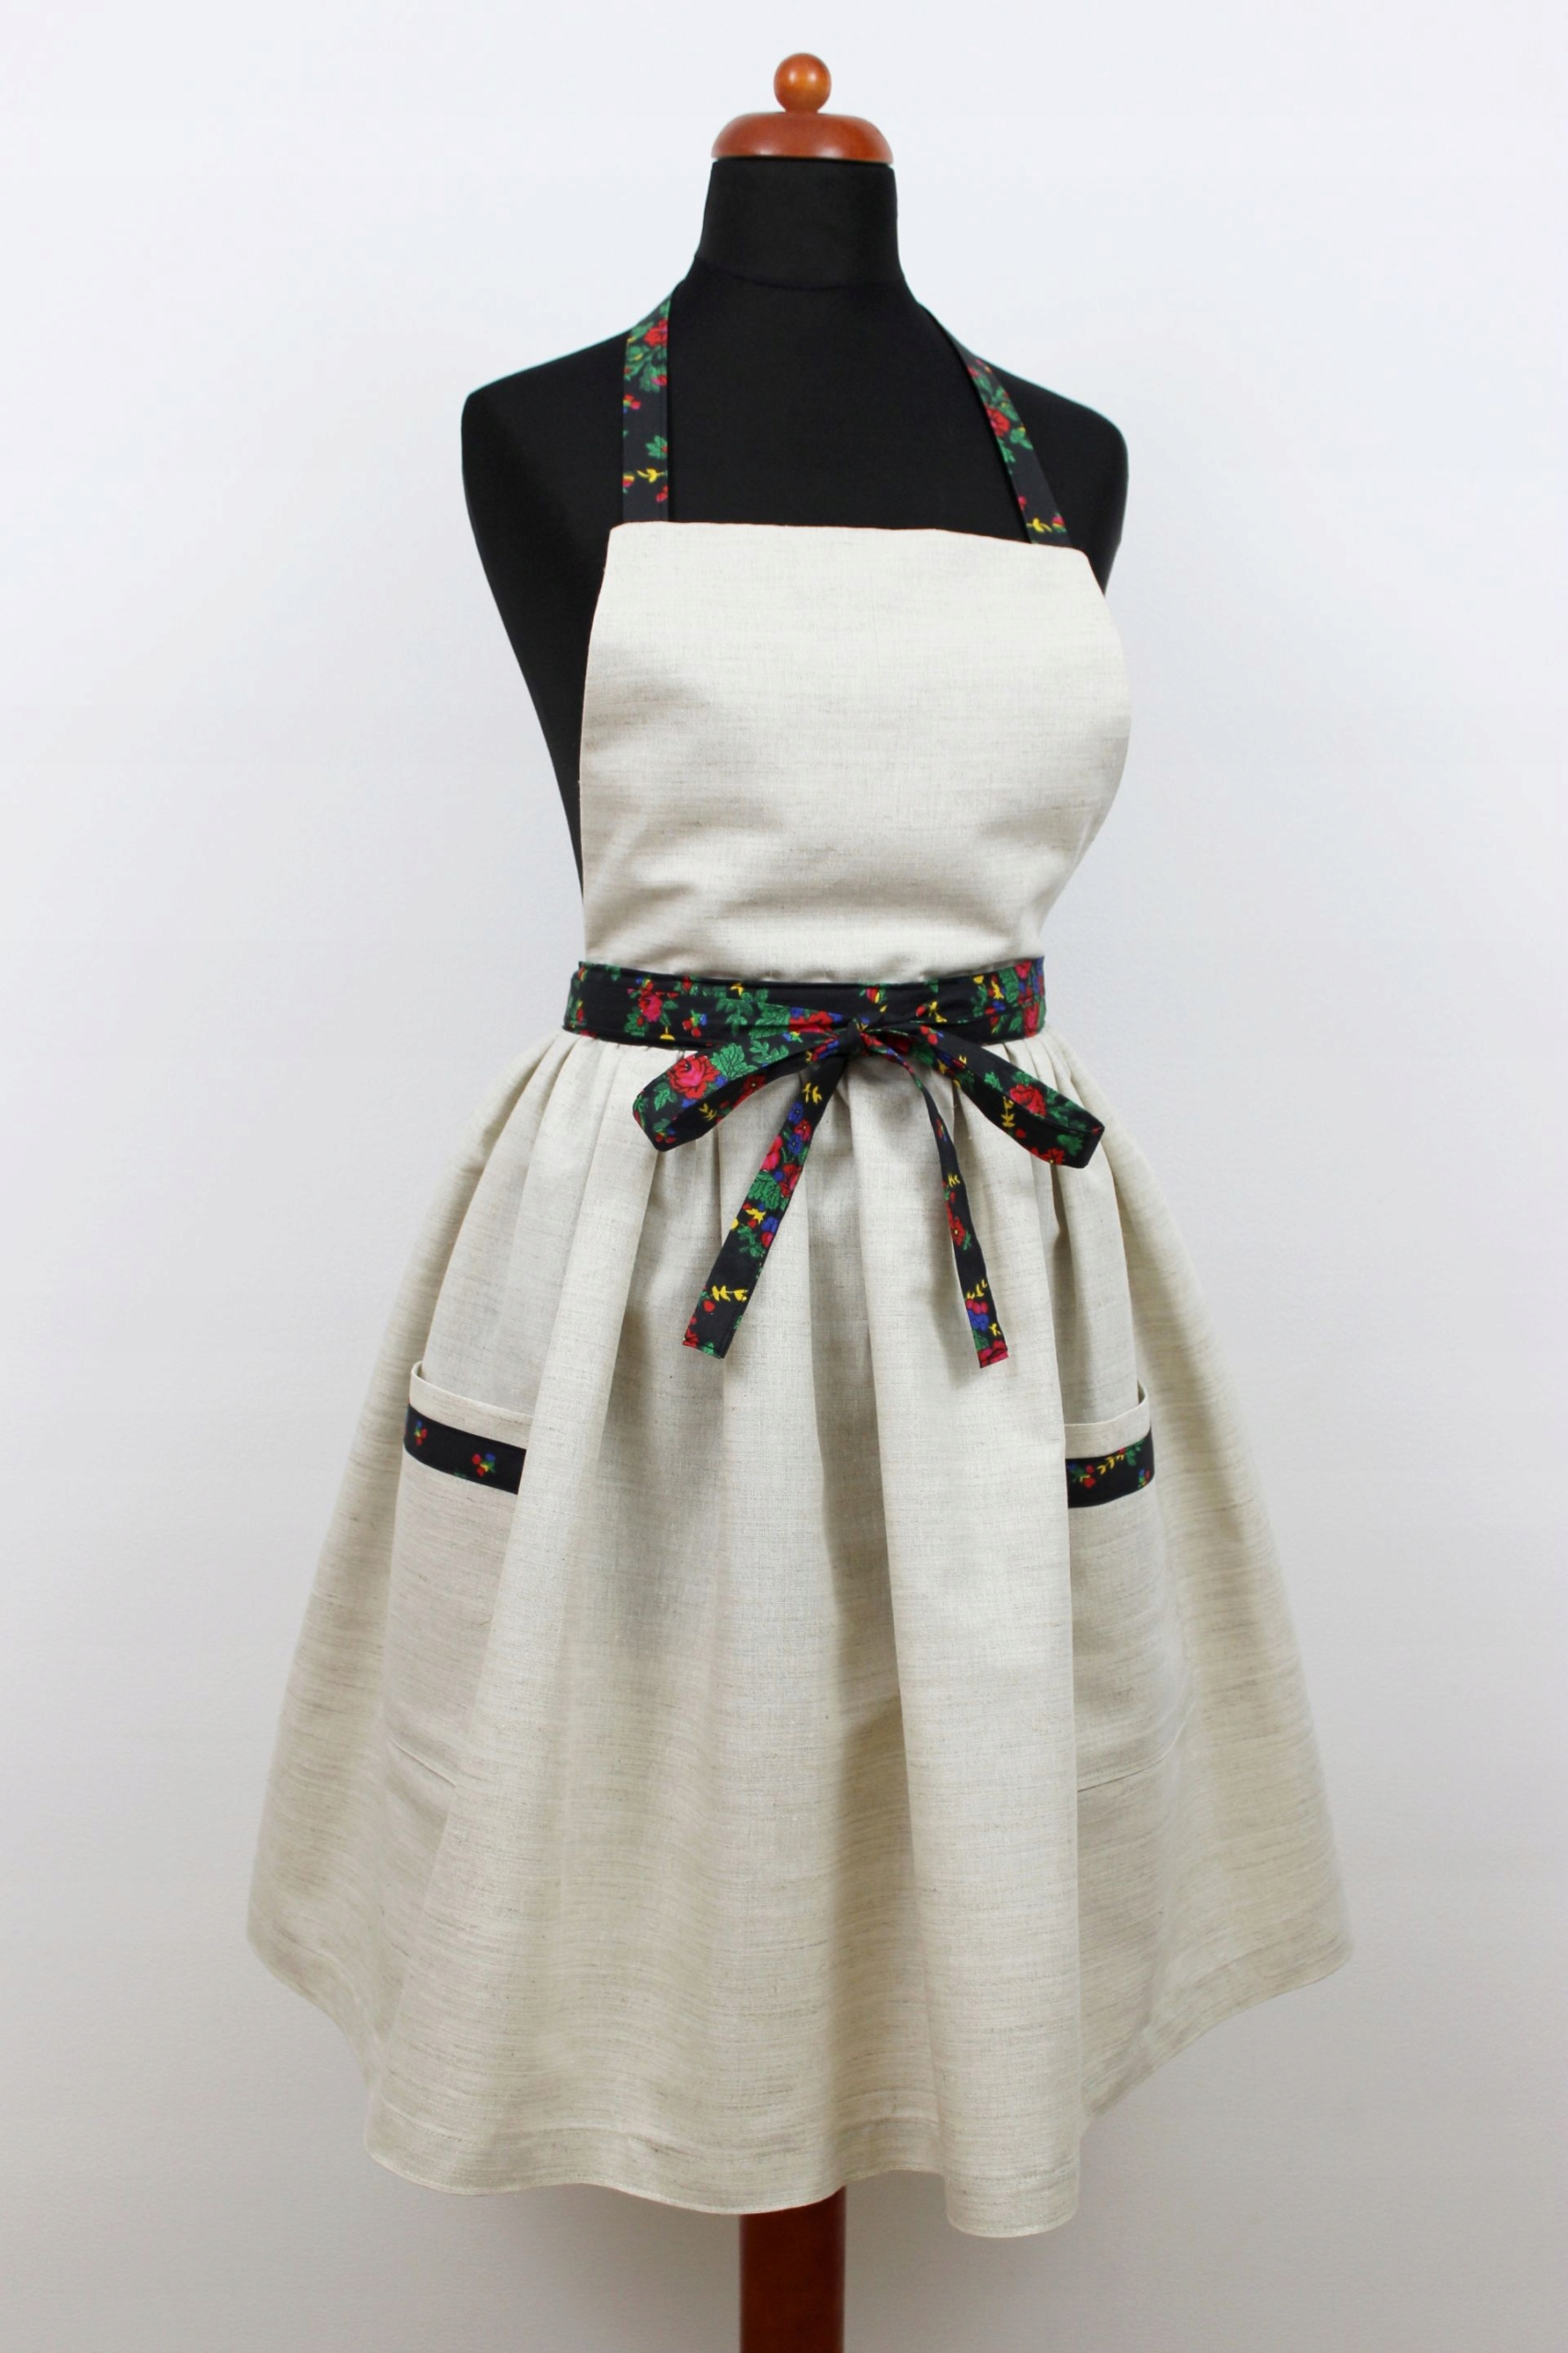 Zástera šaty, bielizeň retro vrecká, kvety, ľudová